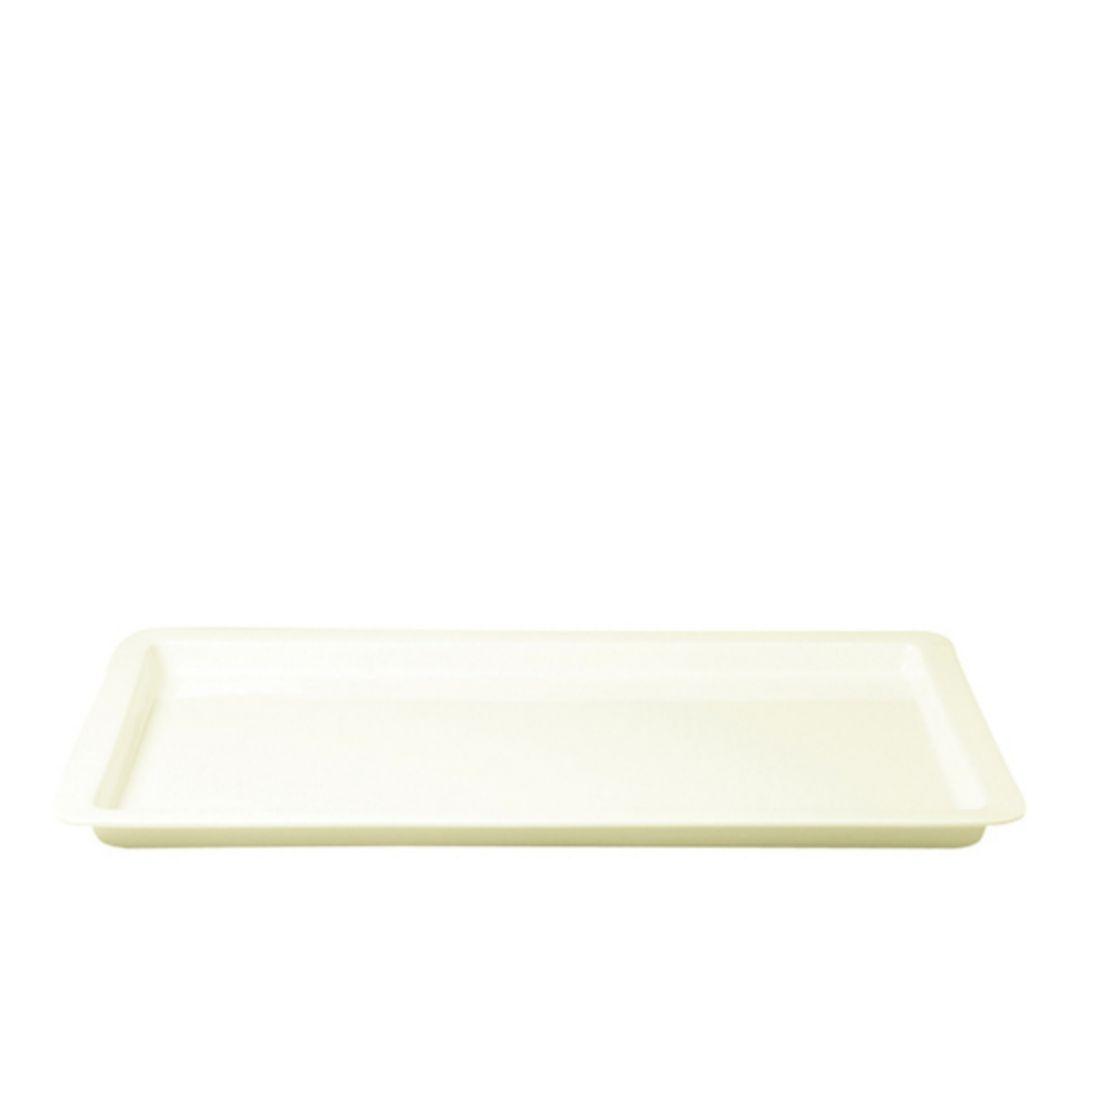 Buffet gastronádoba GN 1/1 53 x 32,5 cm x 2,2